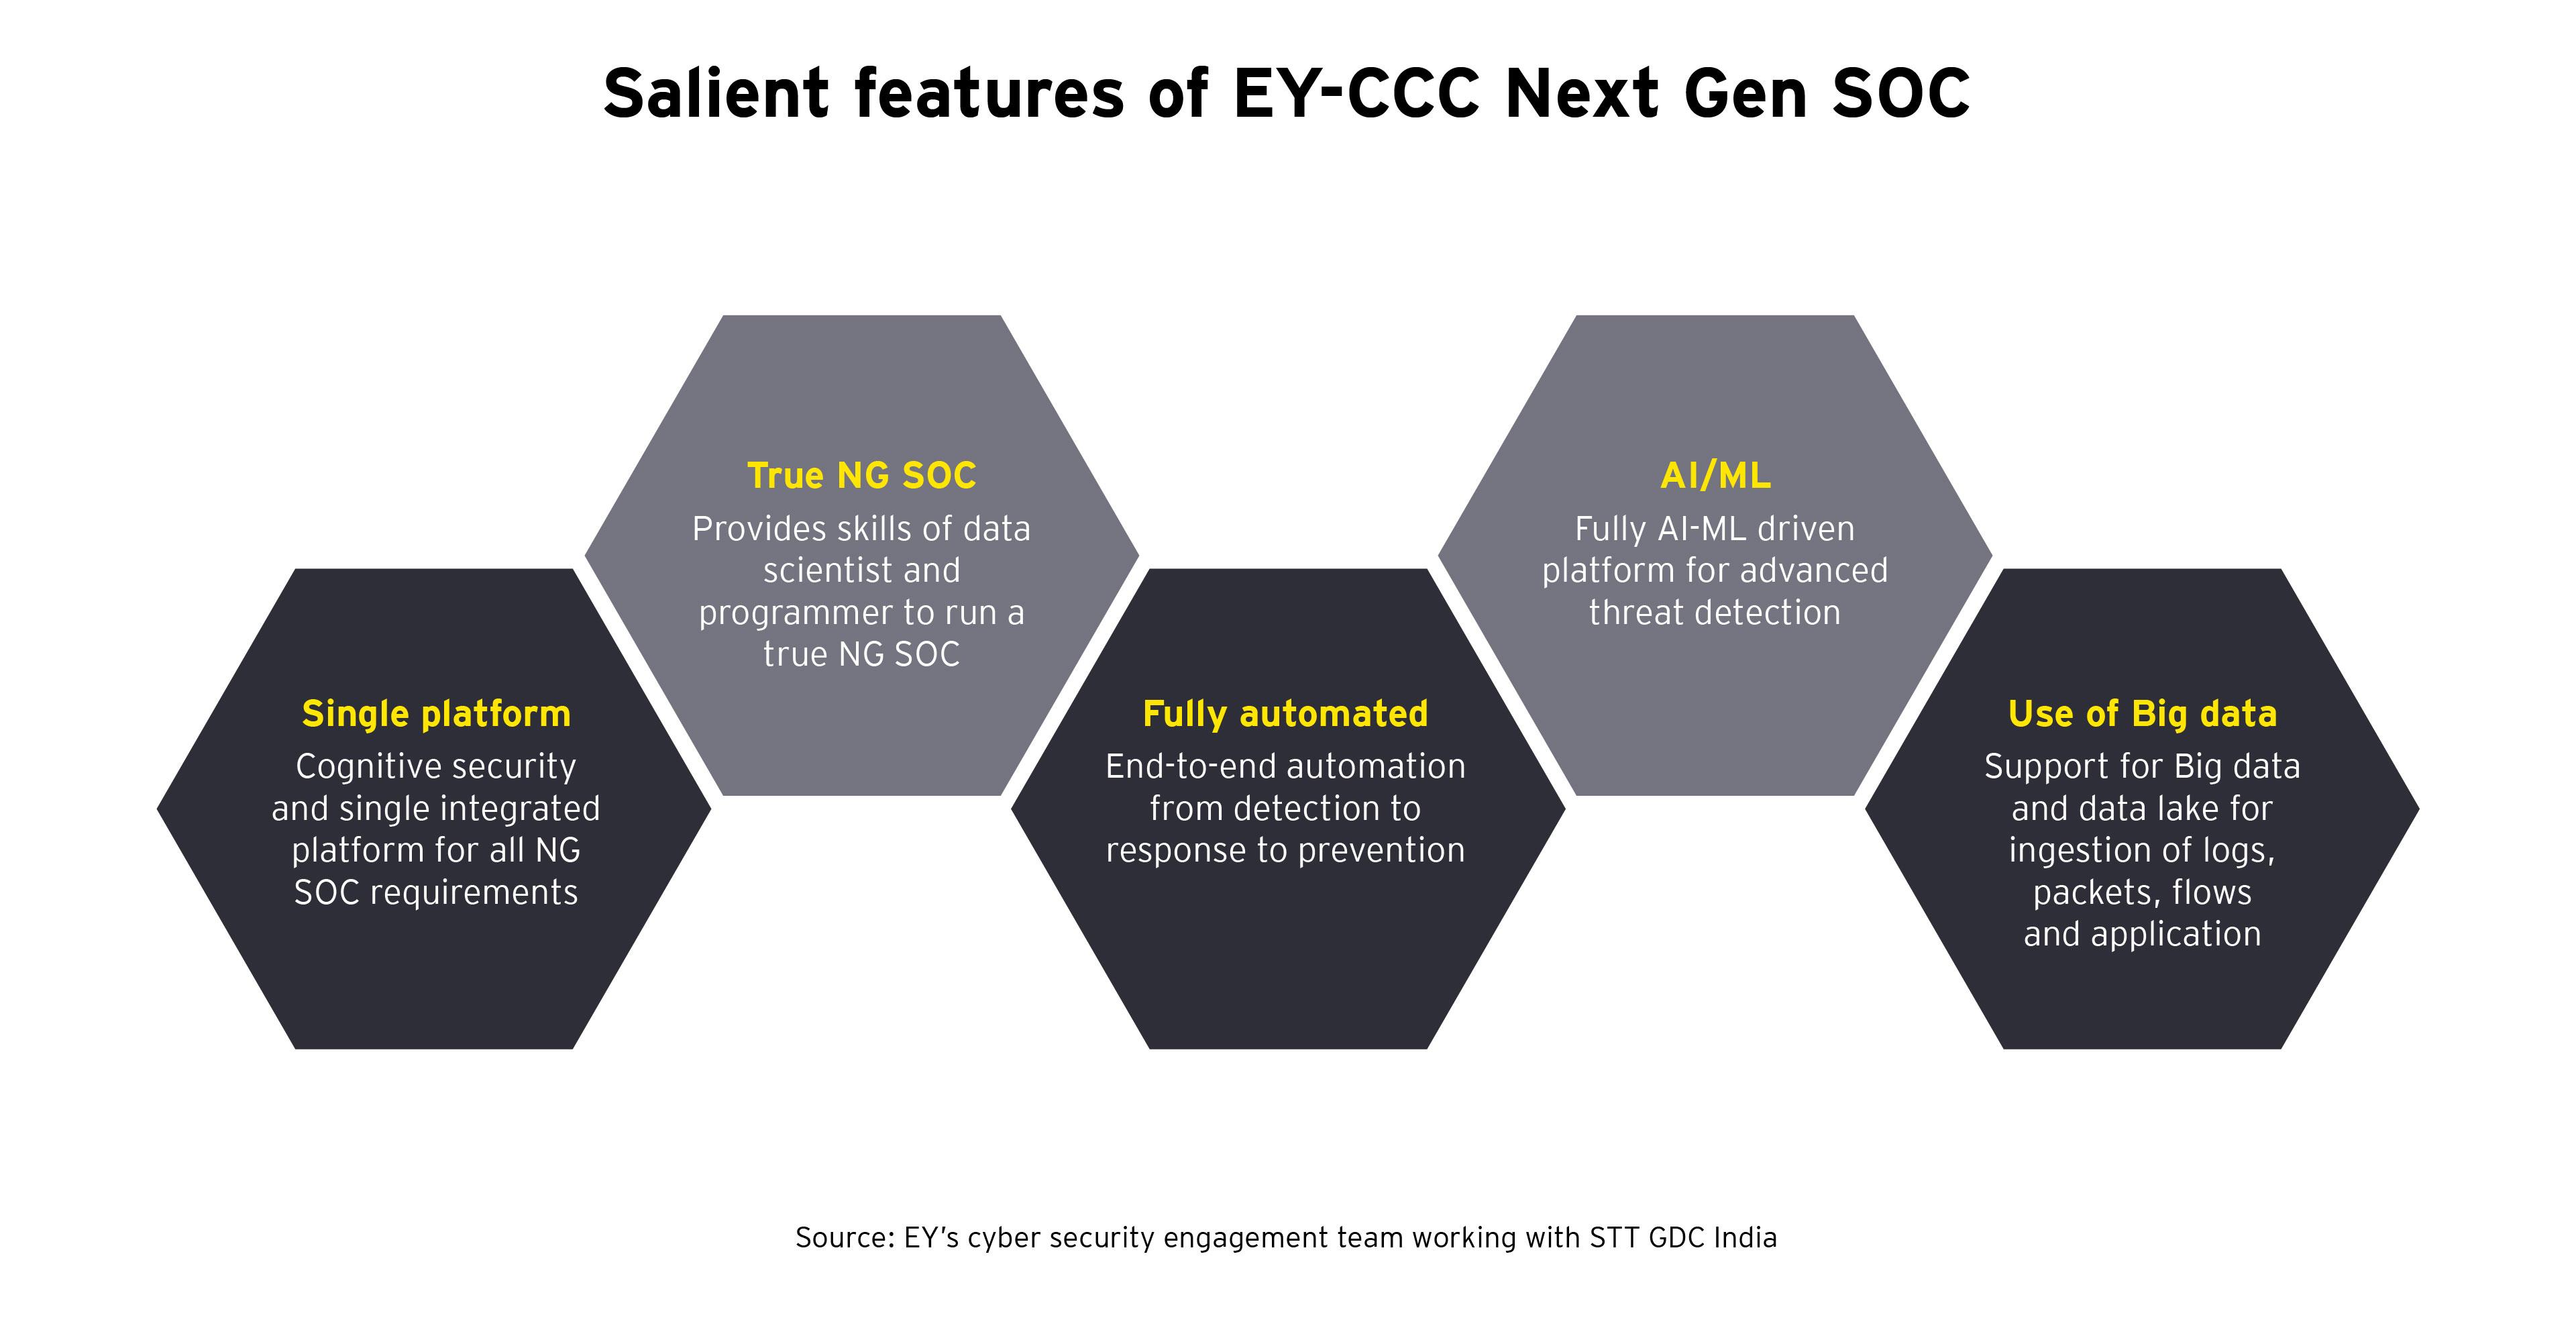 Salient features of EY-CCC Next Gen SOC